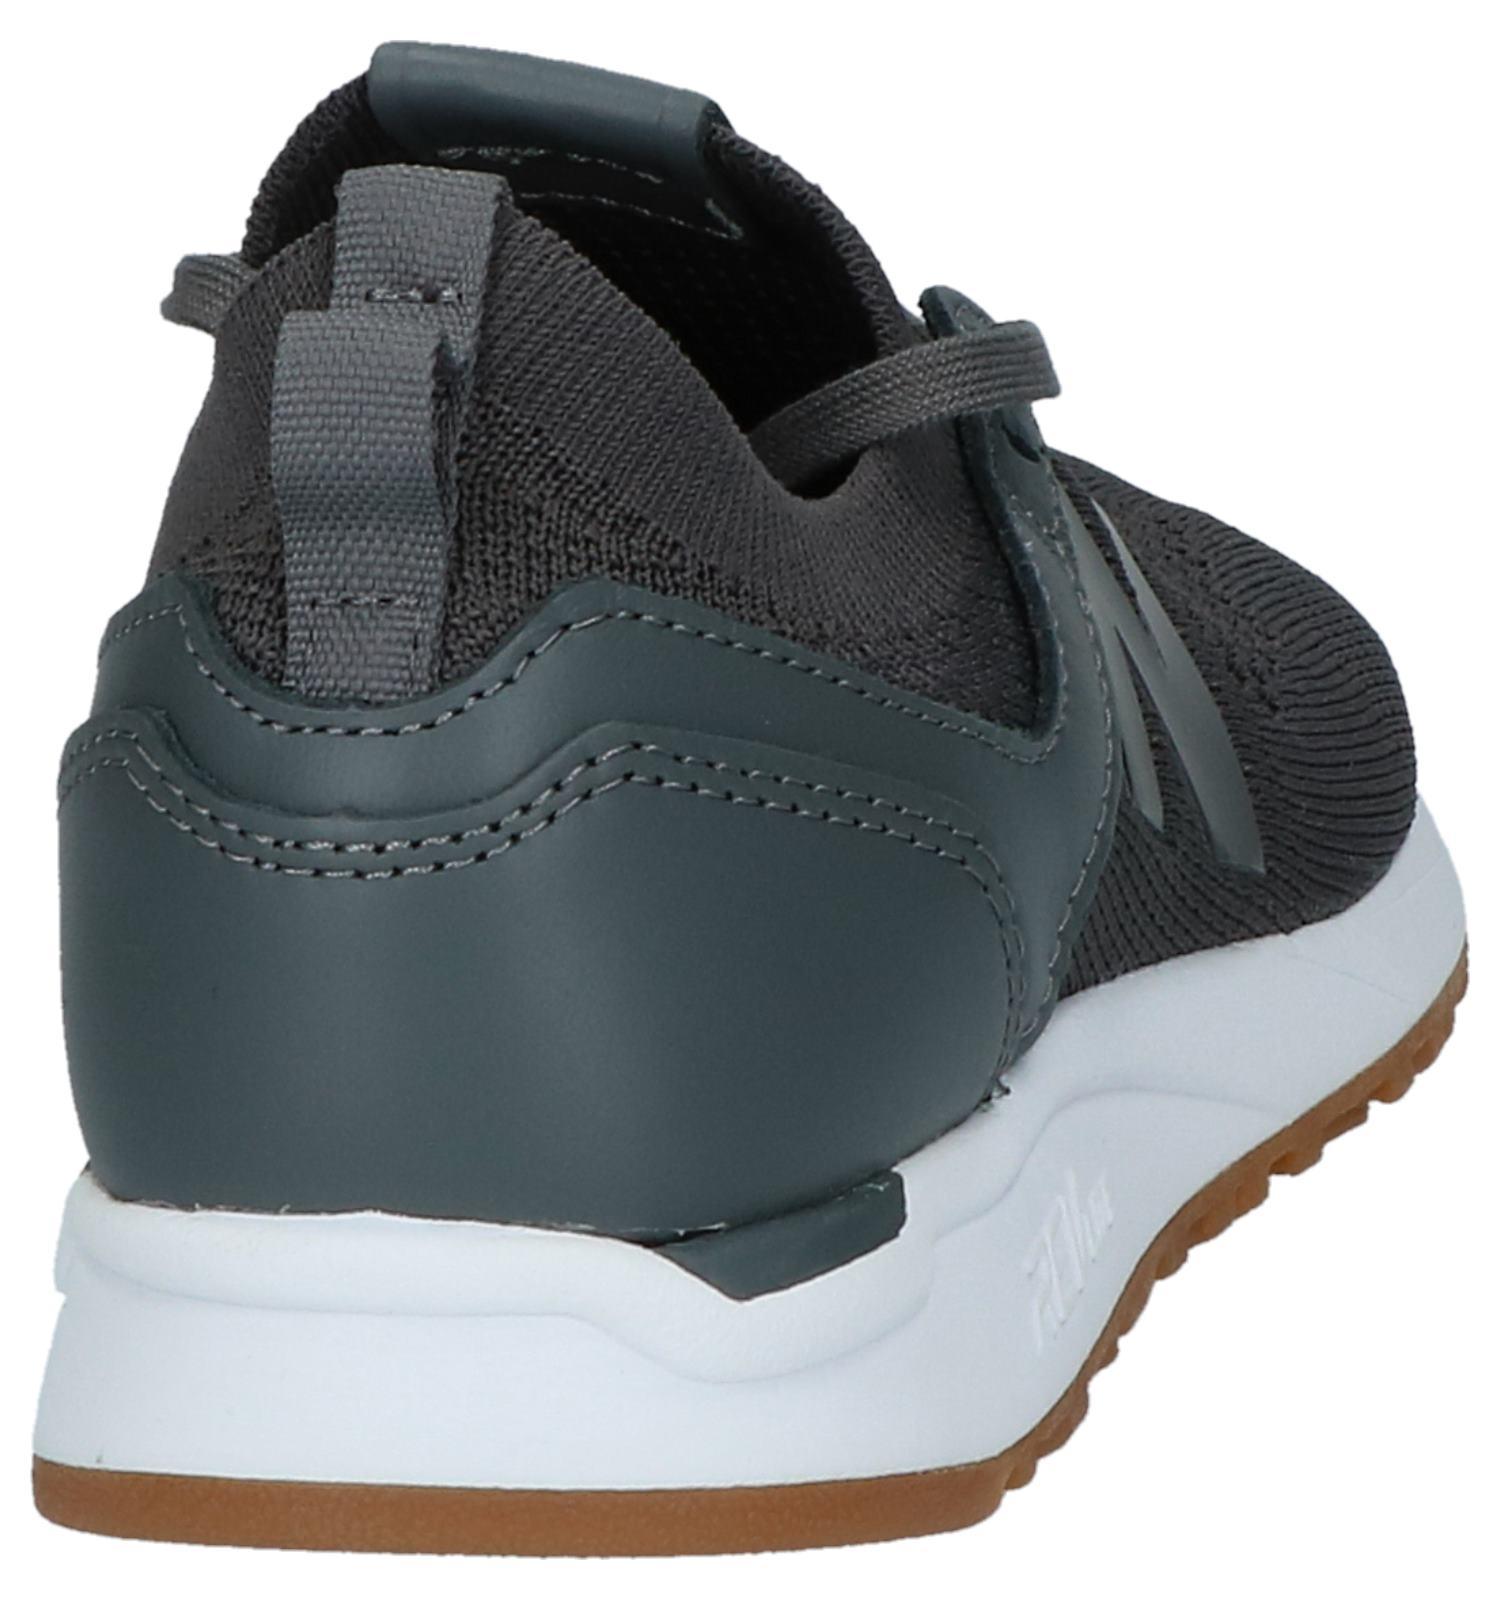 Balance Balance Ndew Wrl247 Wrl247 Grijze Grijze Sneakers Balance Ndew Sneakers Ndew m0wvN8n